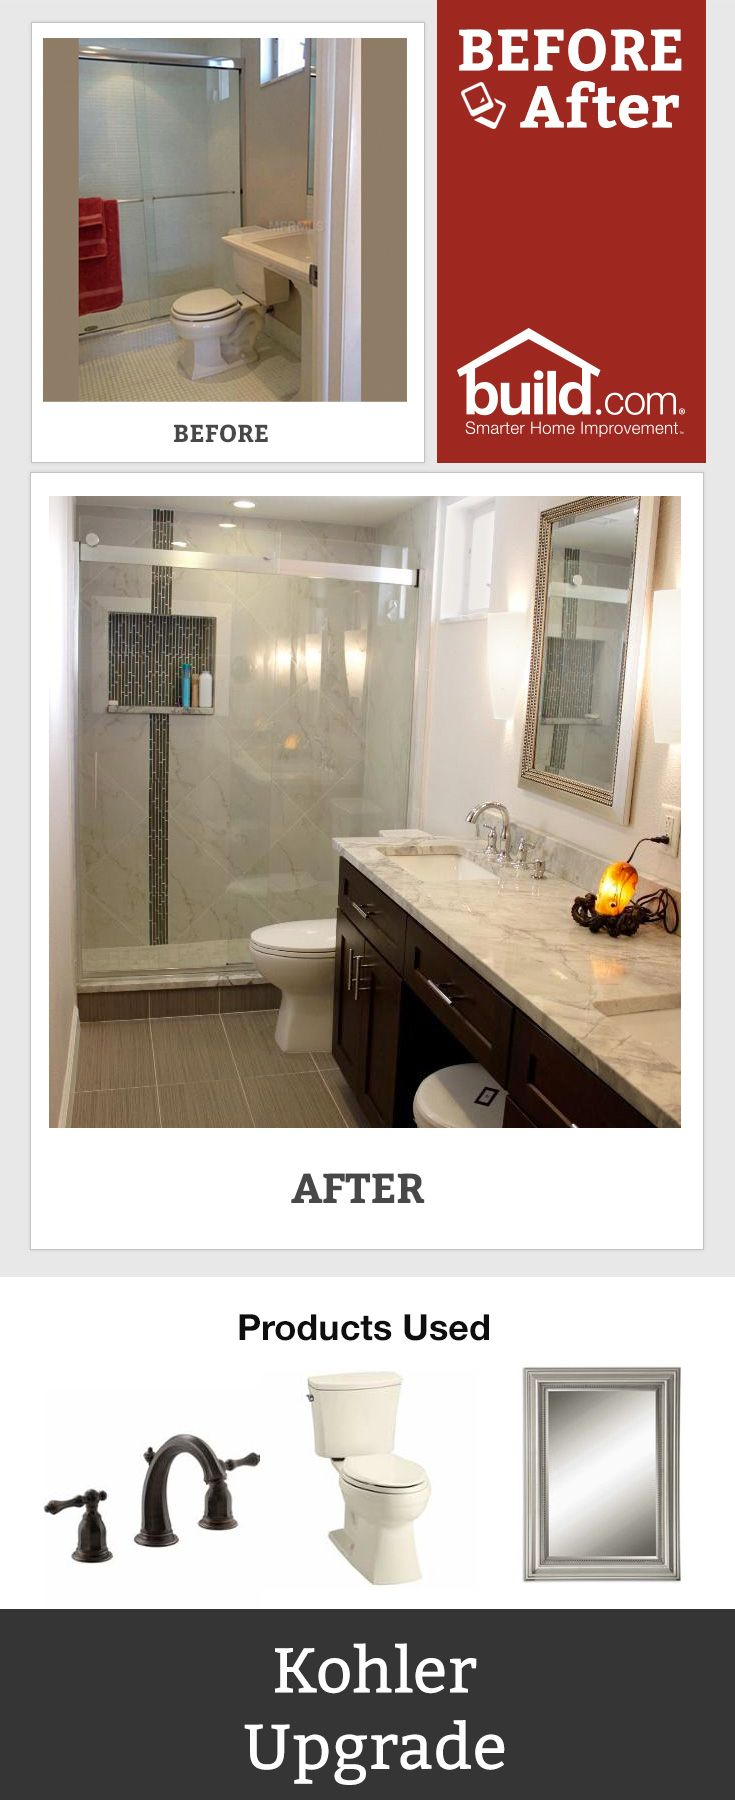 Best Before And After Bathroom Images On Pinterest Bathrooms - Bathroom remodel hendersonville nc